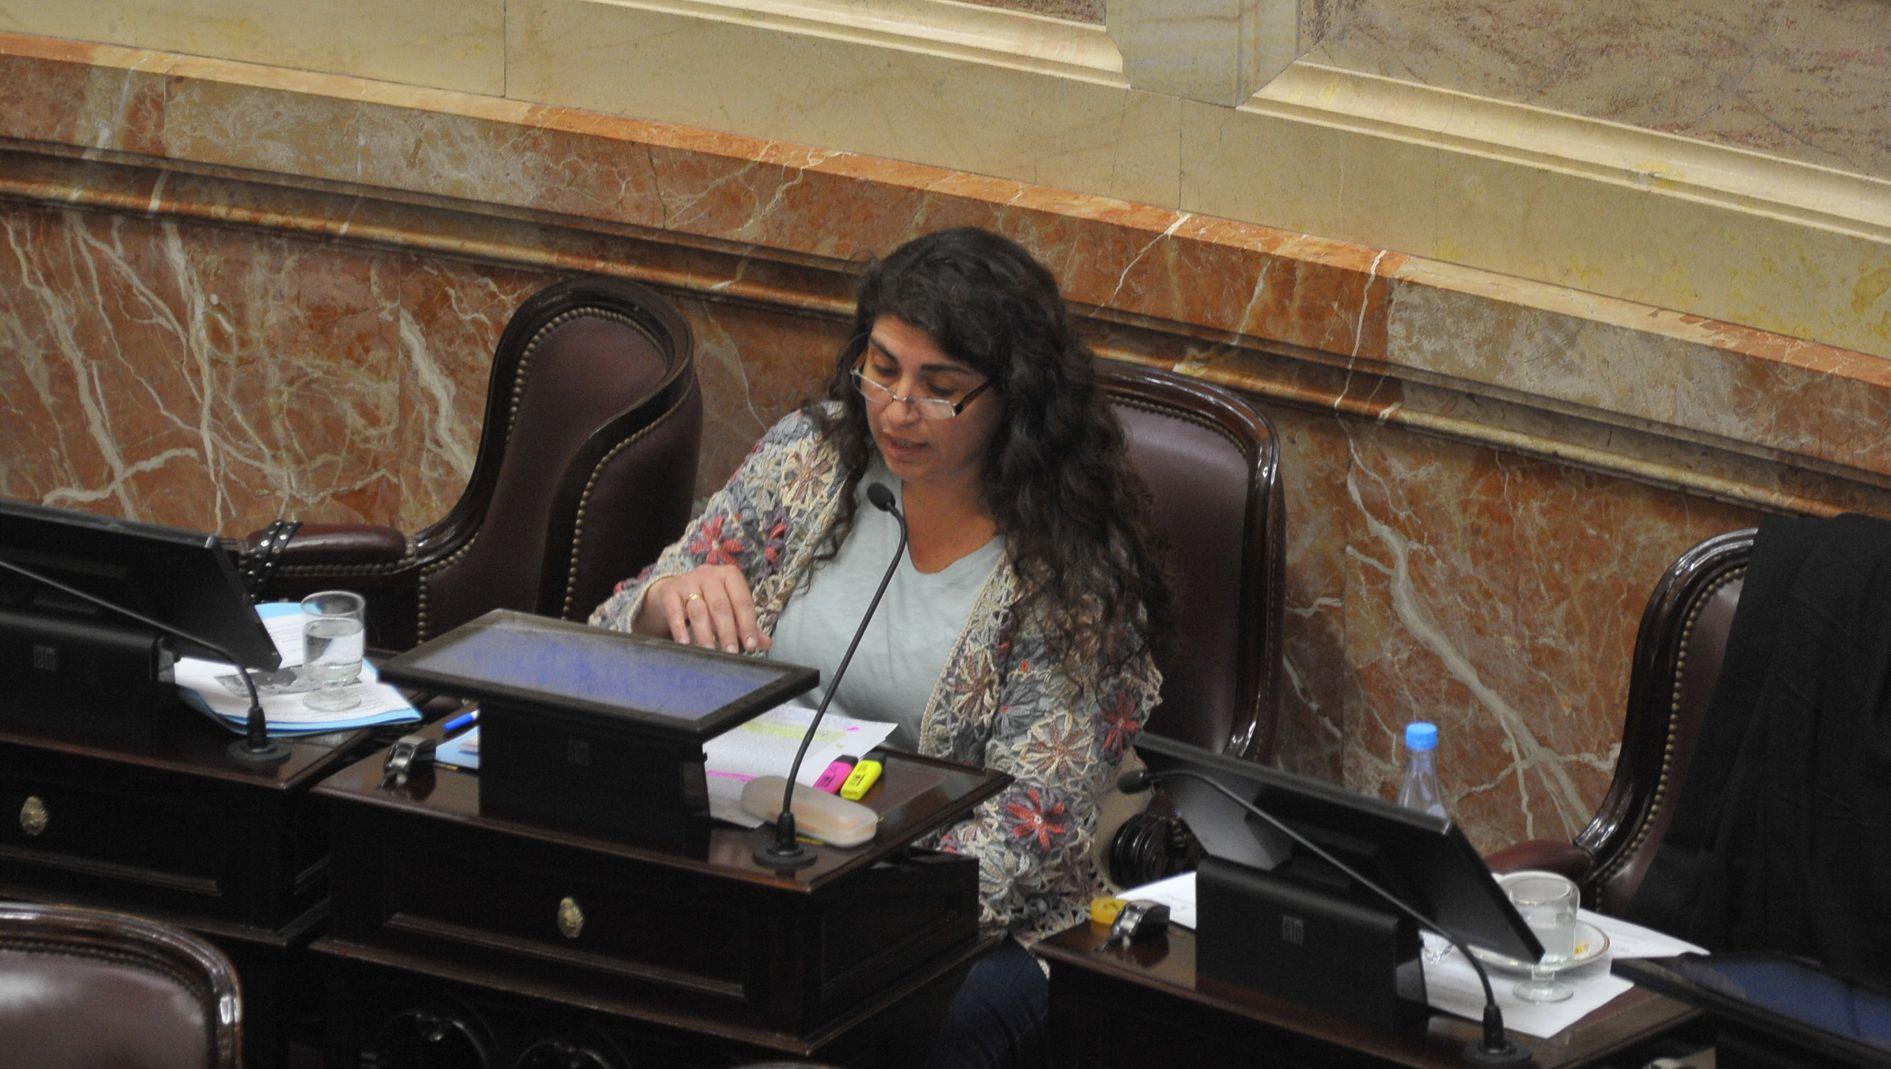 La senadora del bloque Frente para la Victoria – PJ Ana Ianni